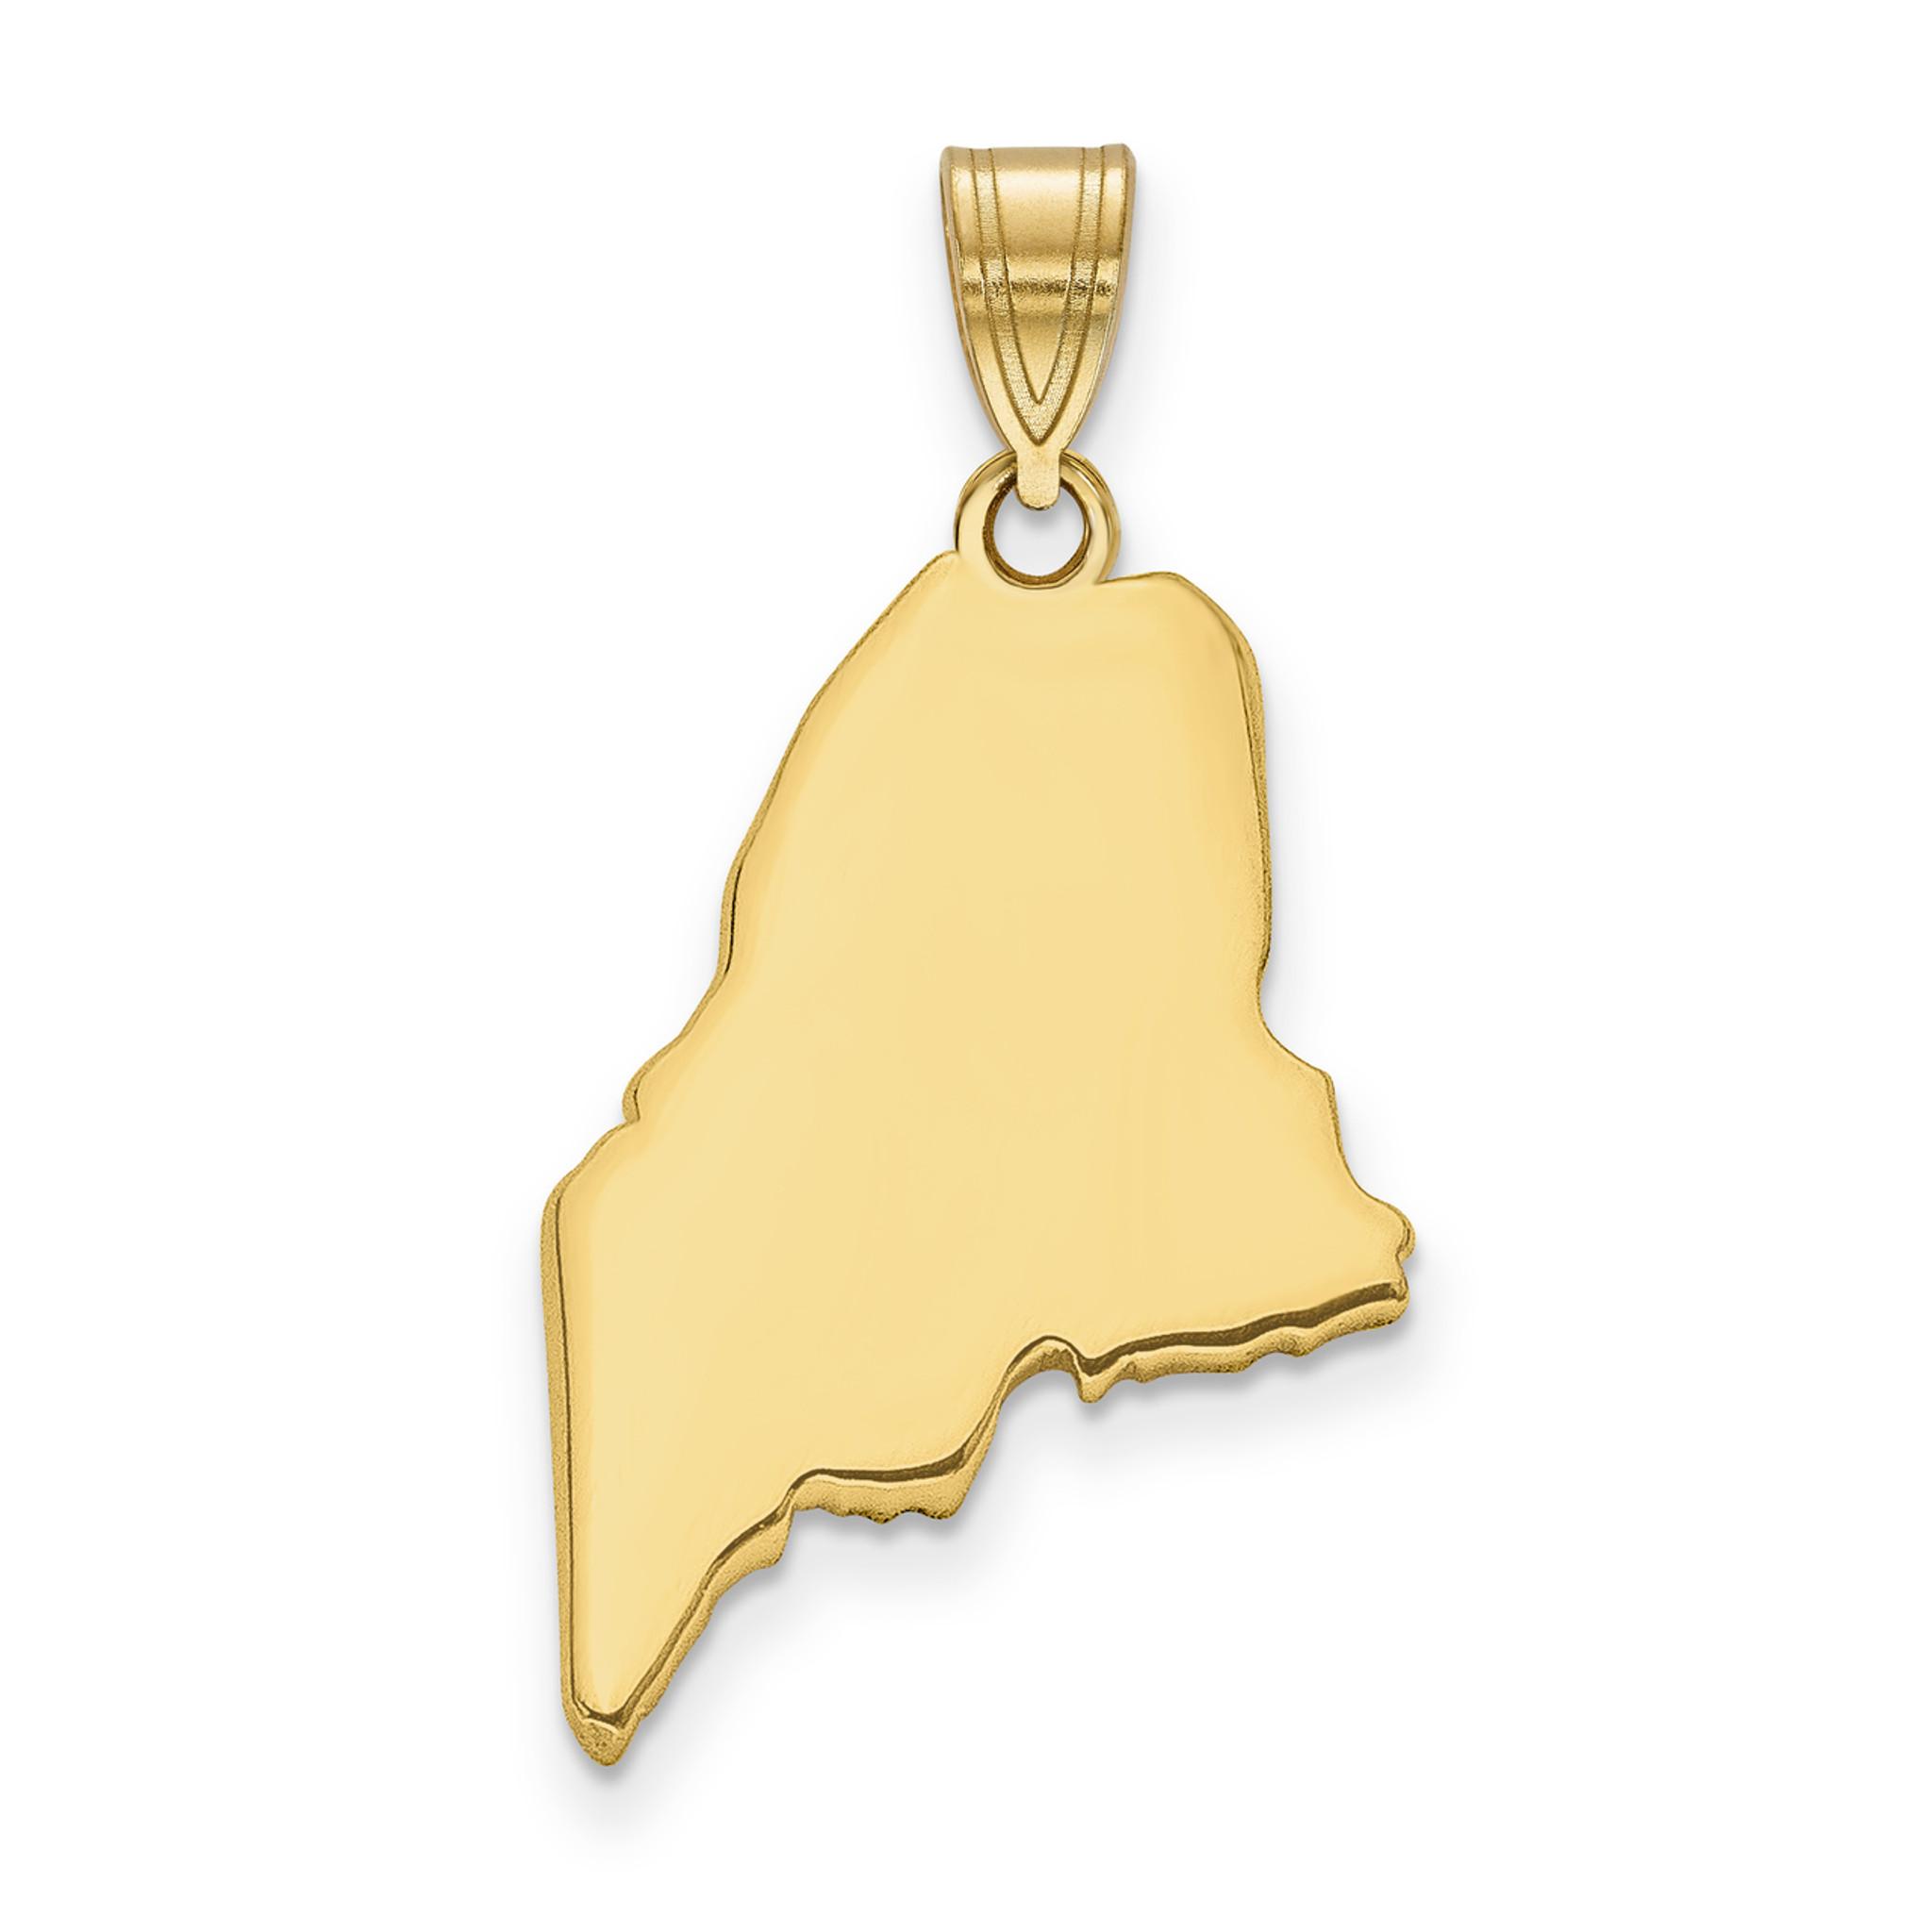 14K Gold Montana State Charm Pendant